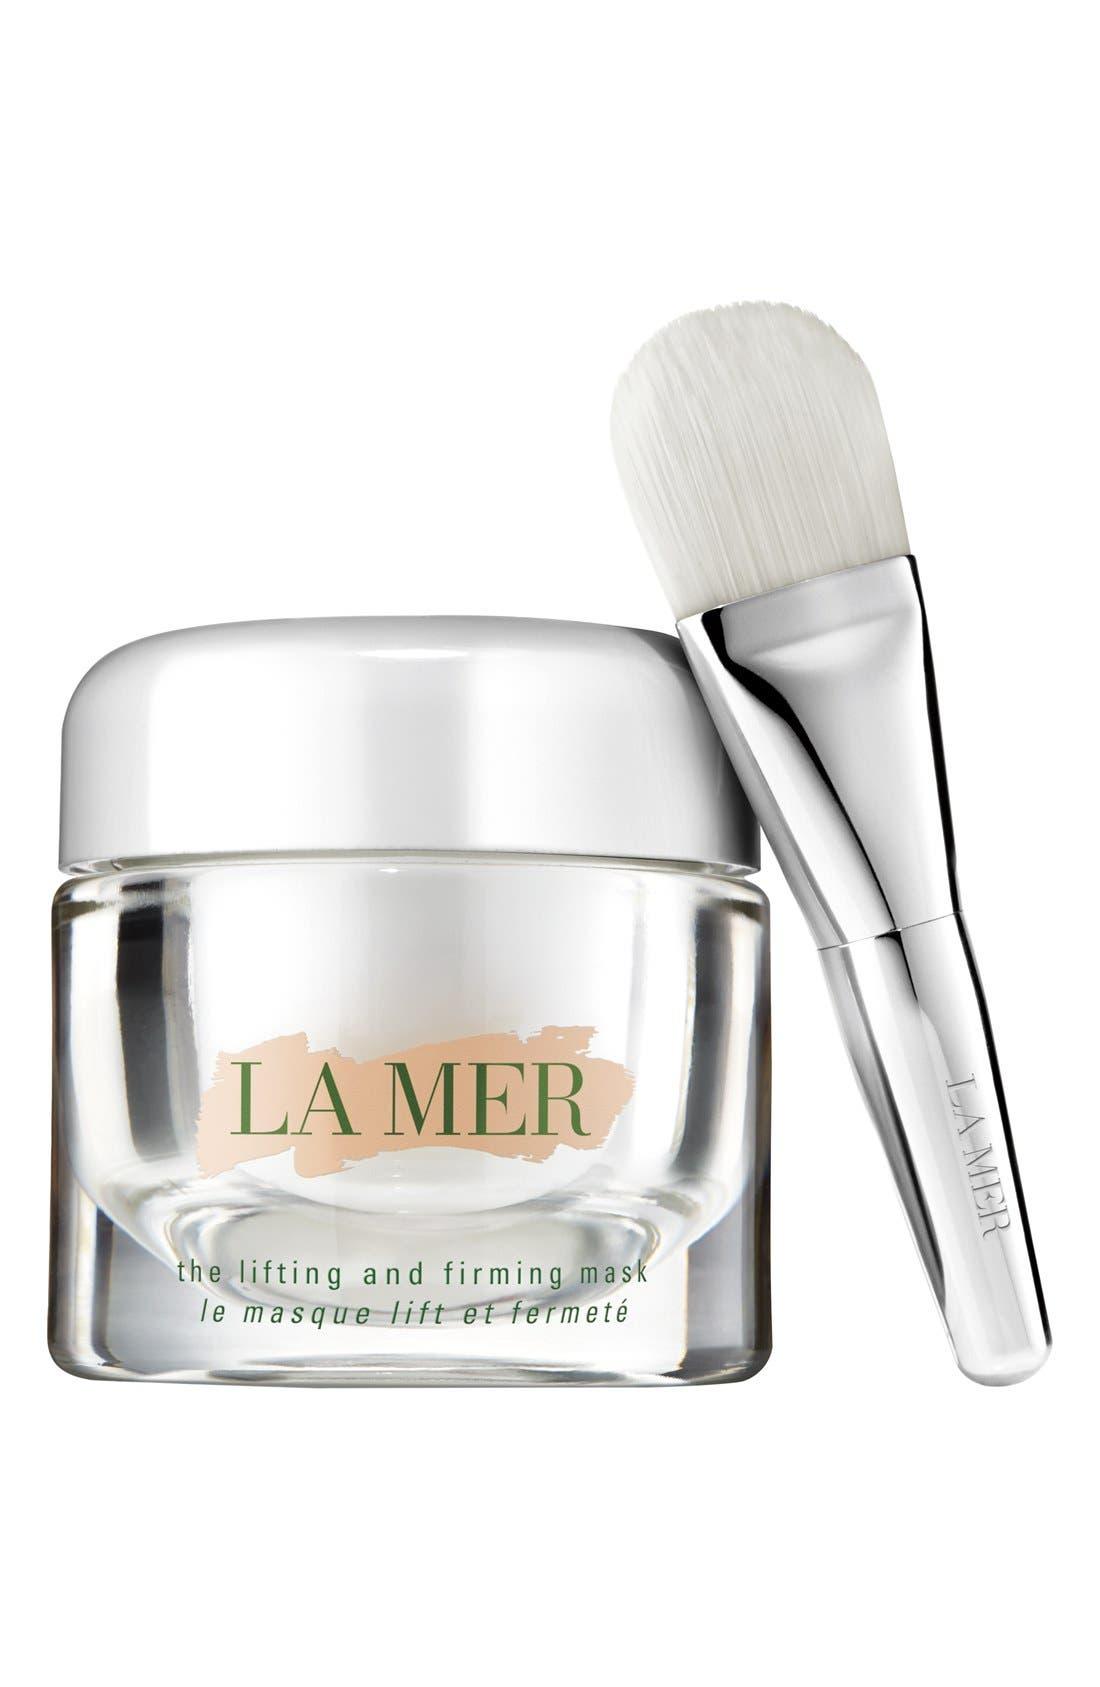 La Mer 'The Lifting & Firming' Mask